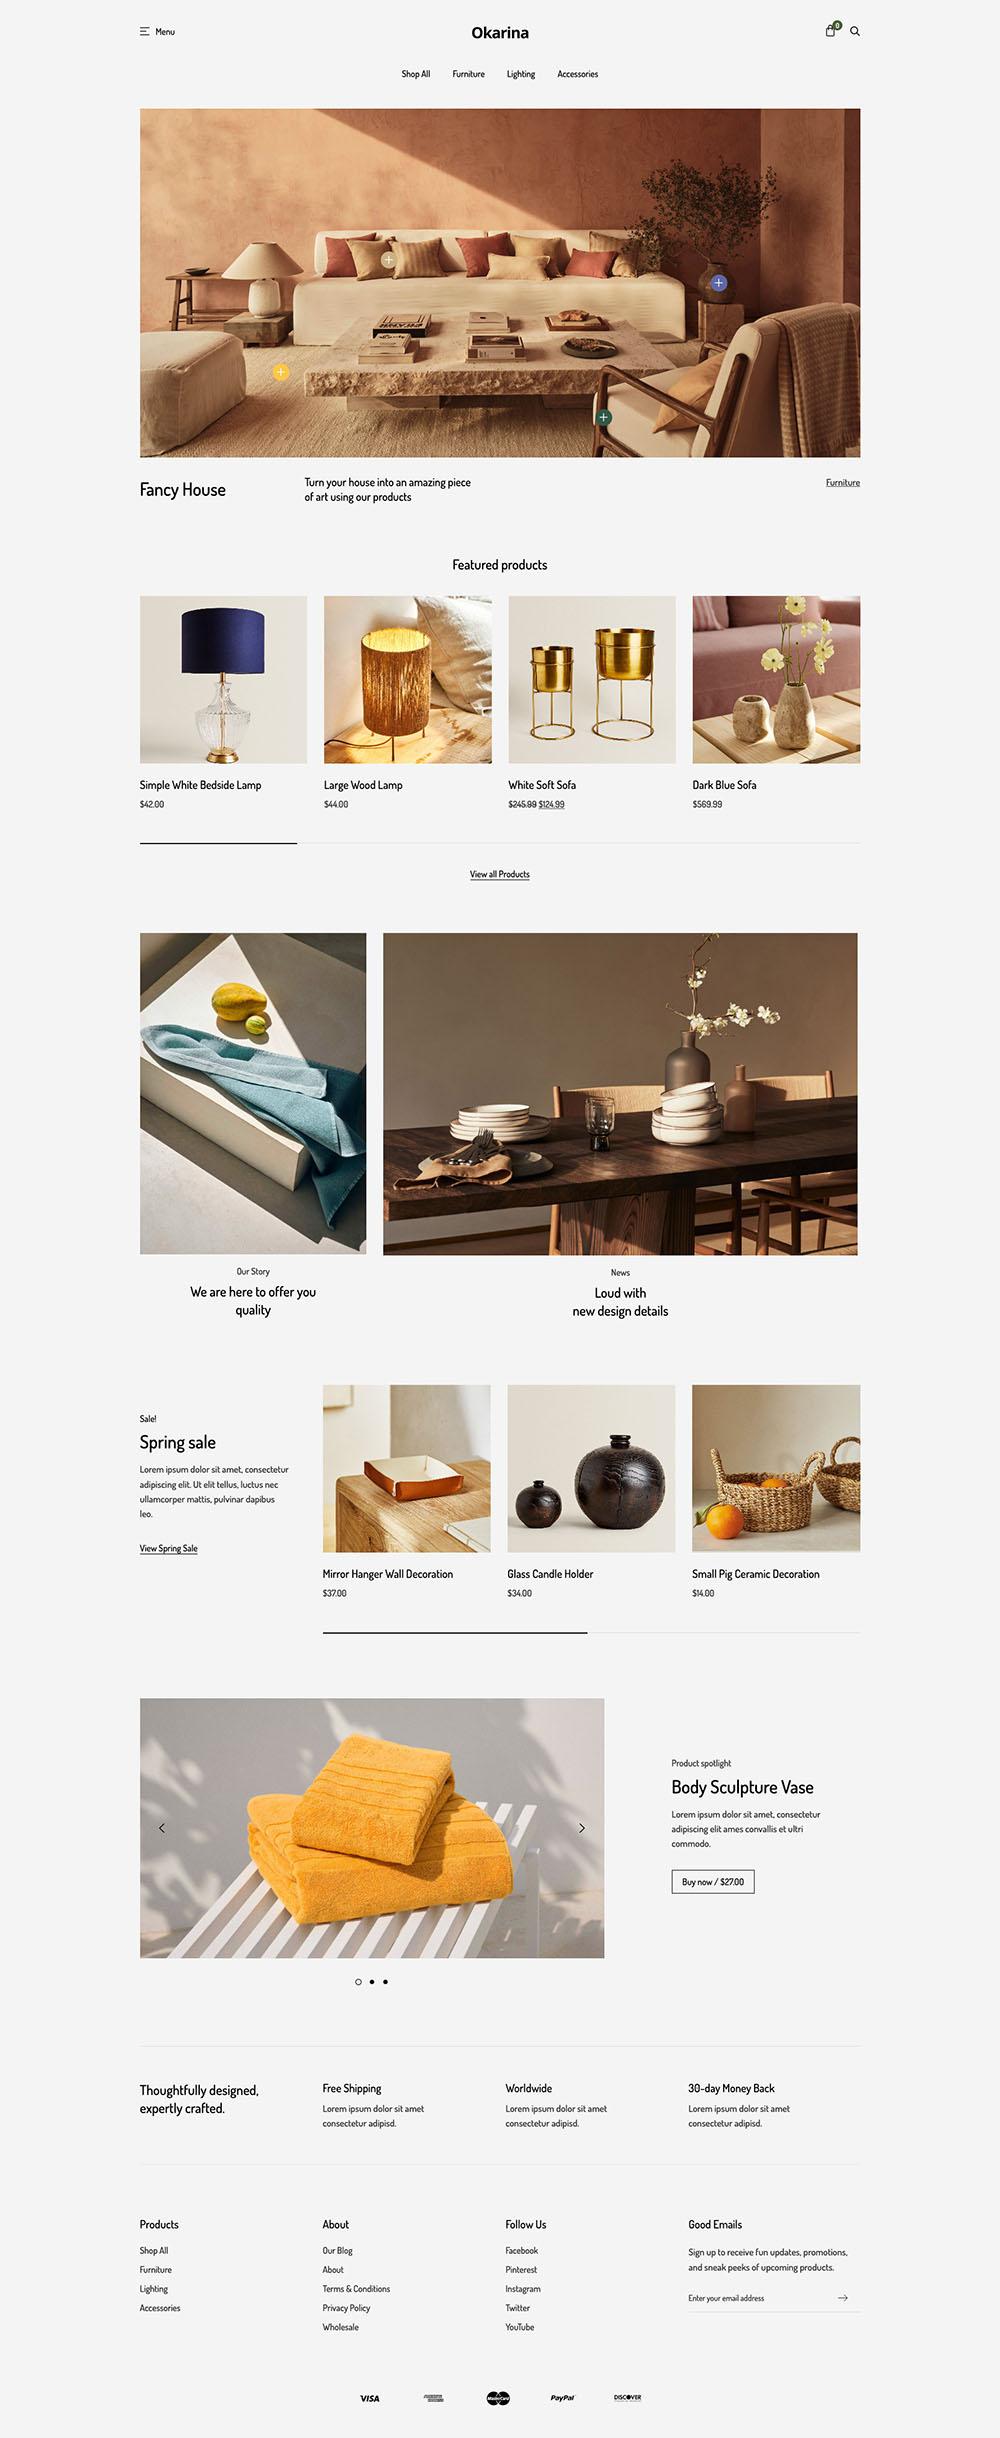 Okarina Furniture Shop Demo Website for eCommerce